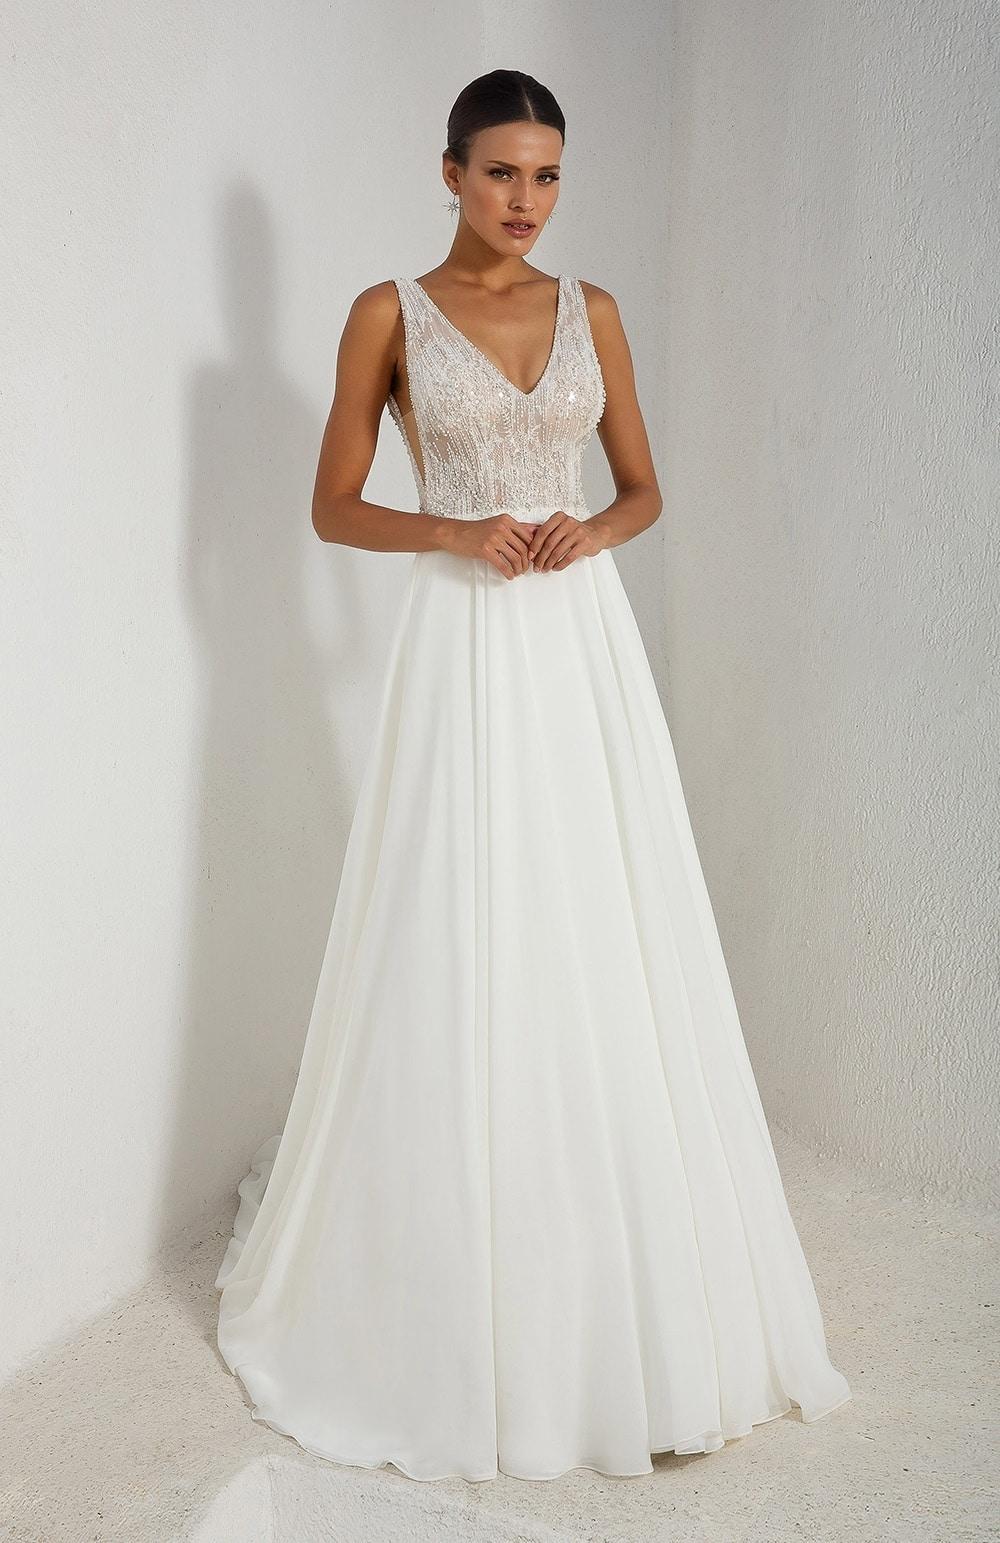 Robe de mariée Modèle Romy